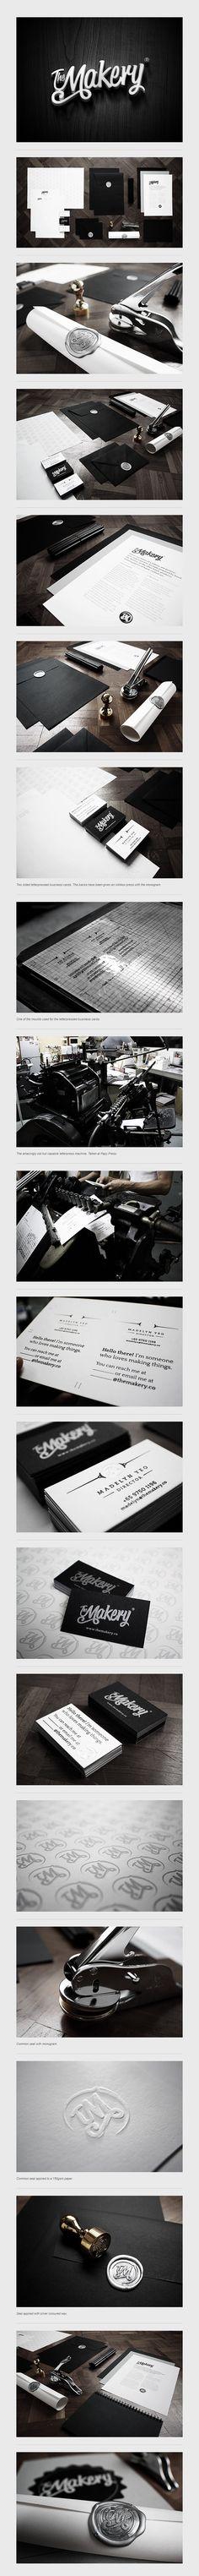 The Makery / David Goh